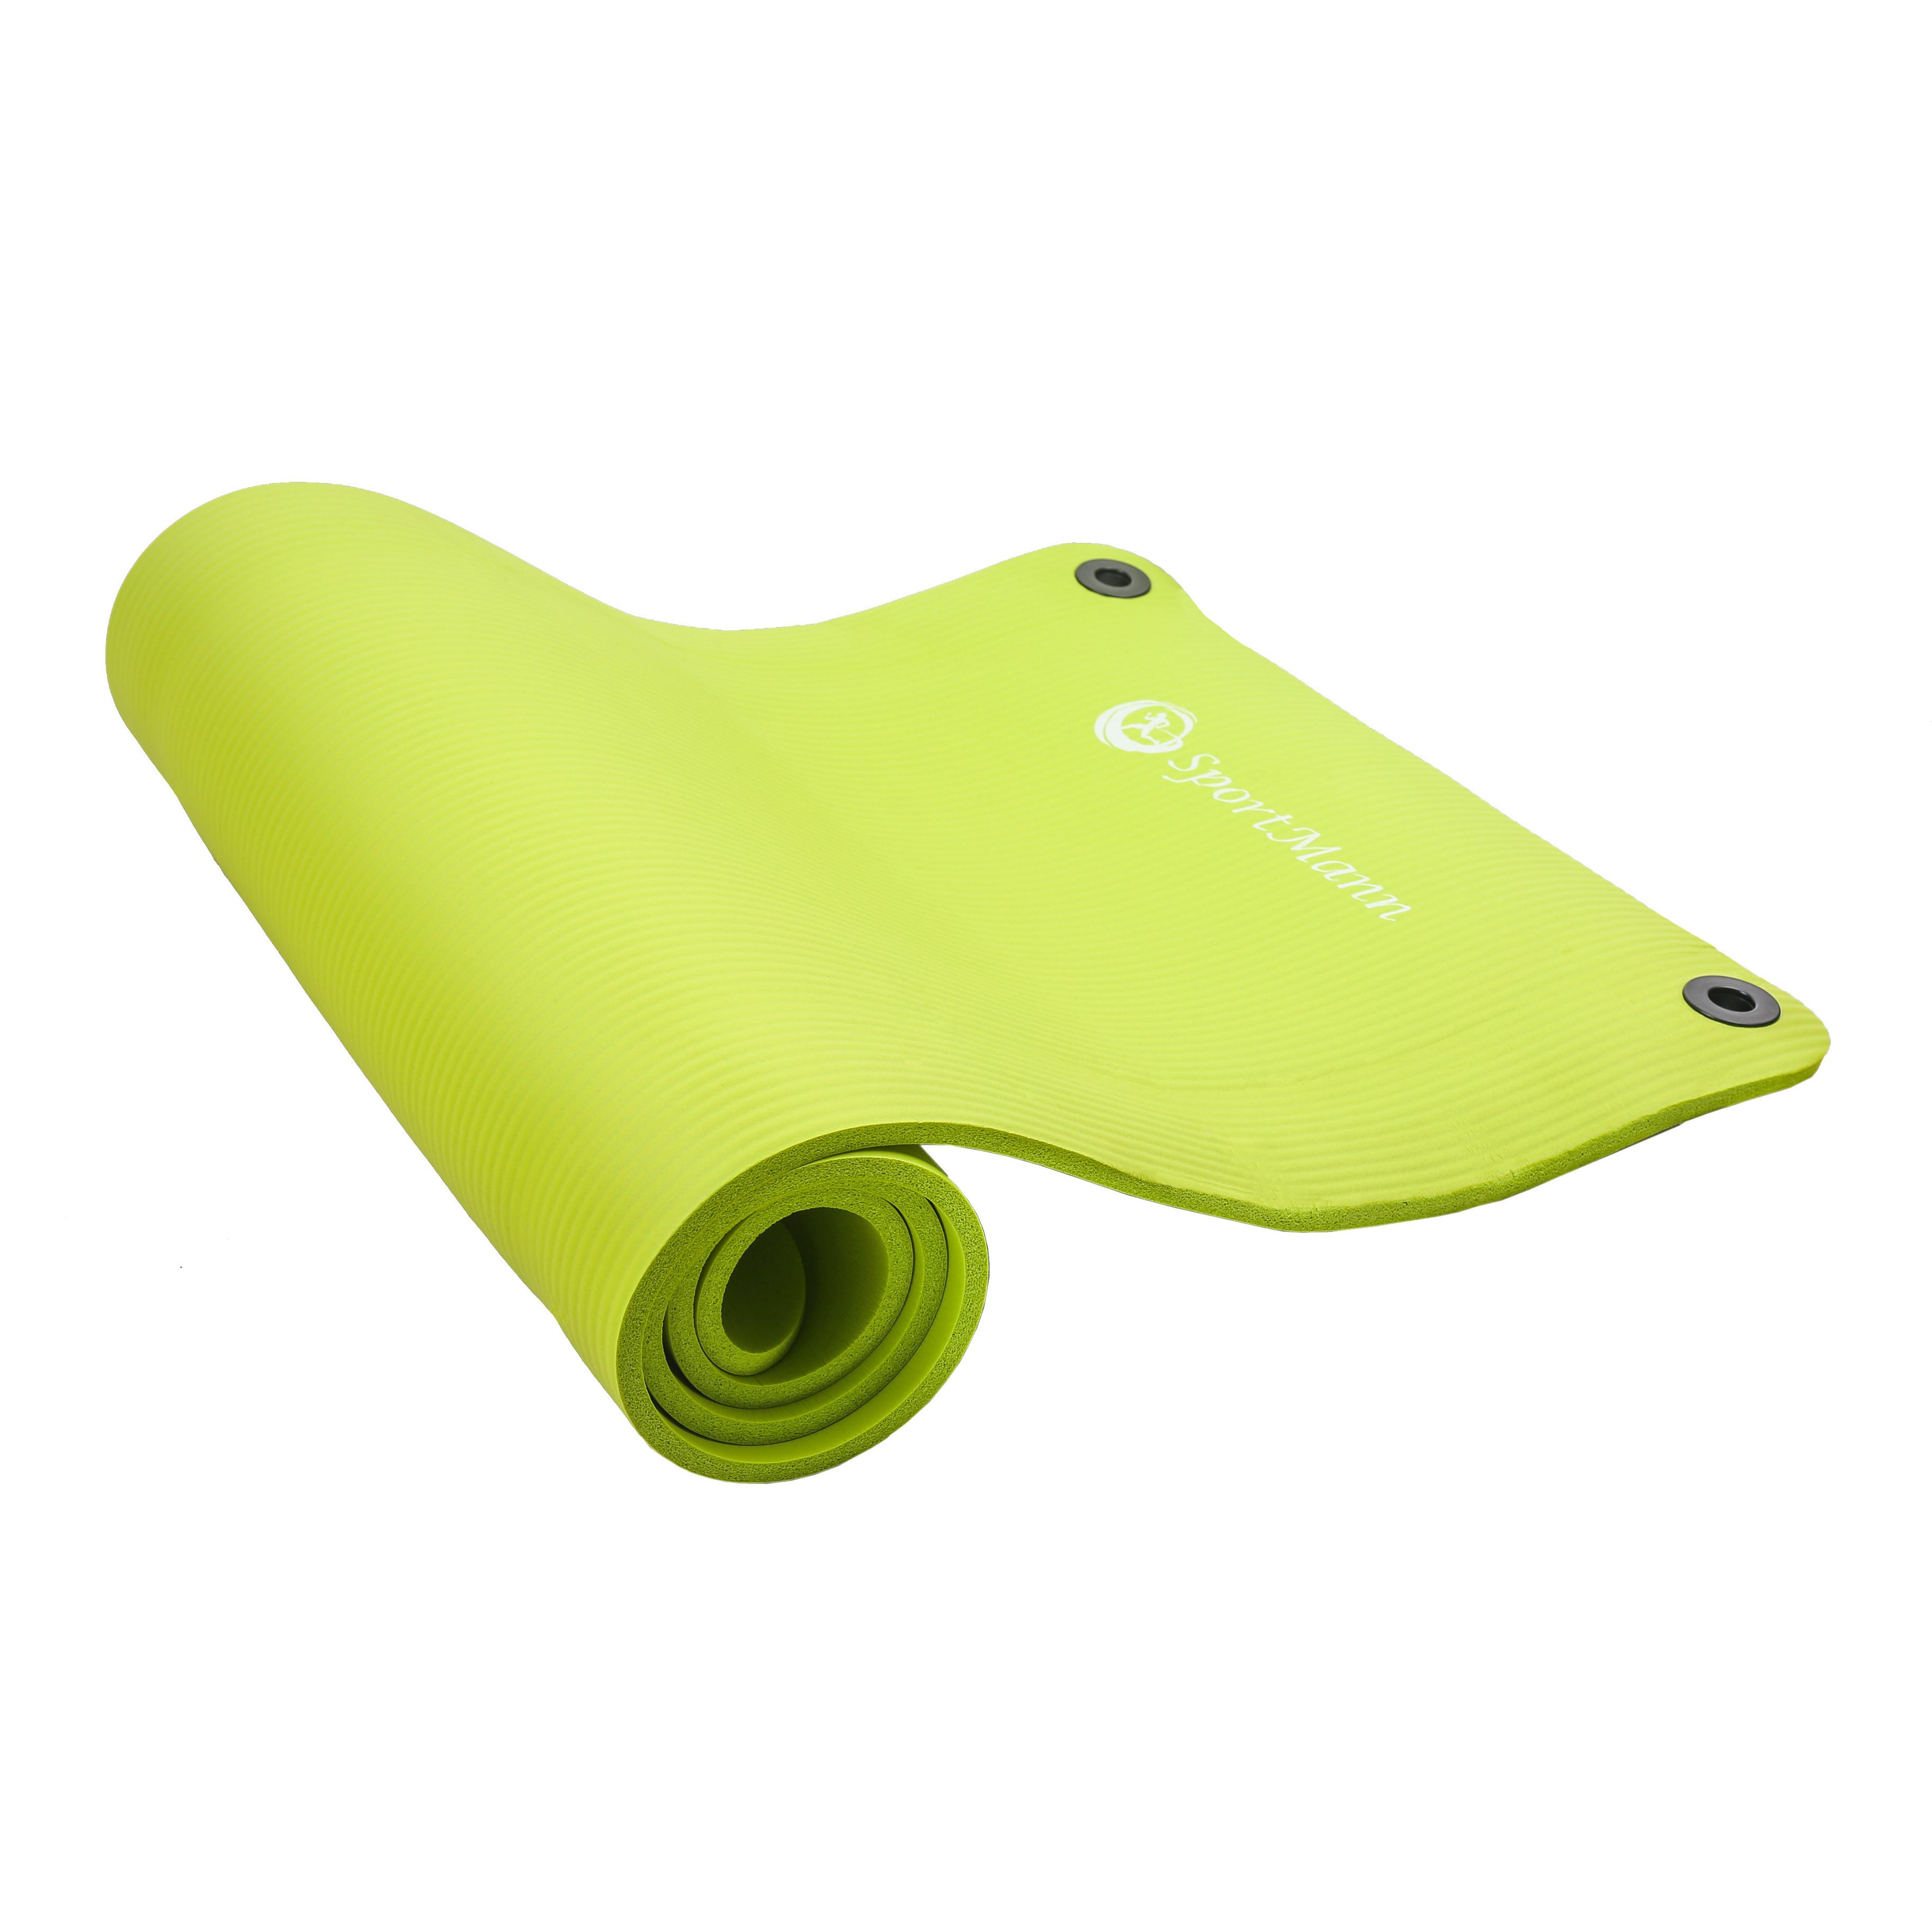 Saltea exercitii fitness si aerobic Profi, 180x60x1cm, verde